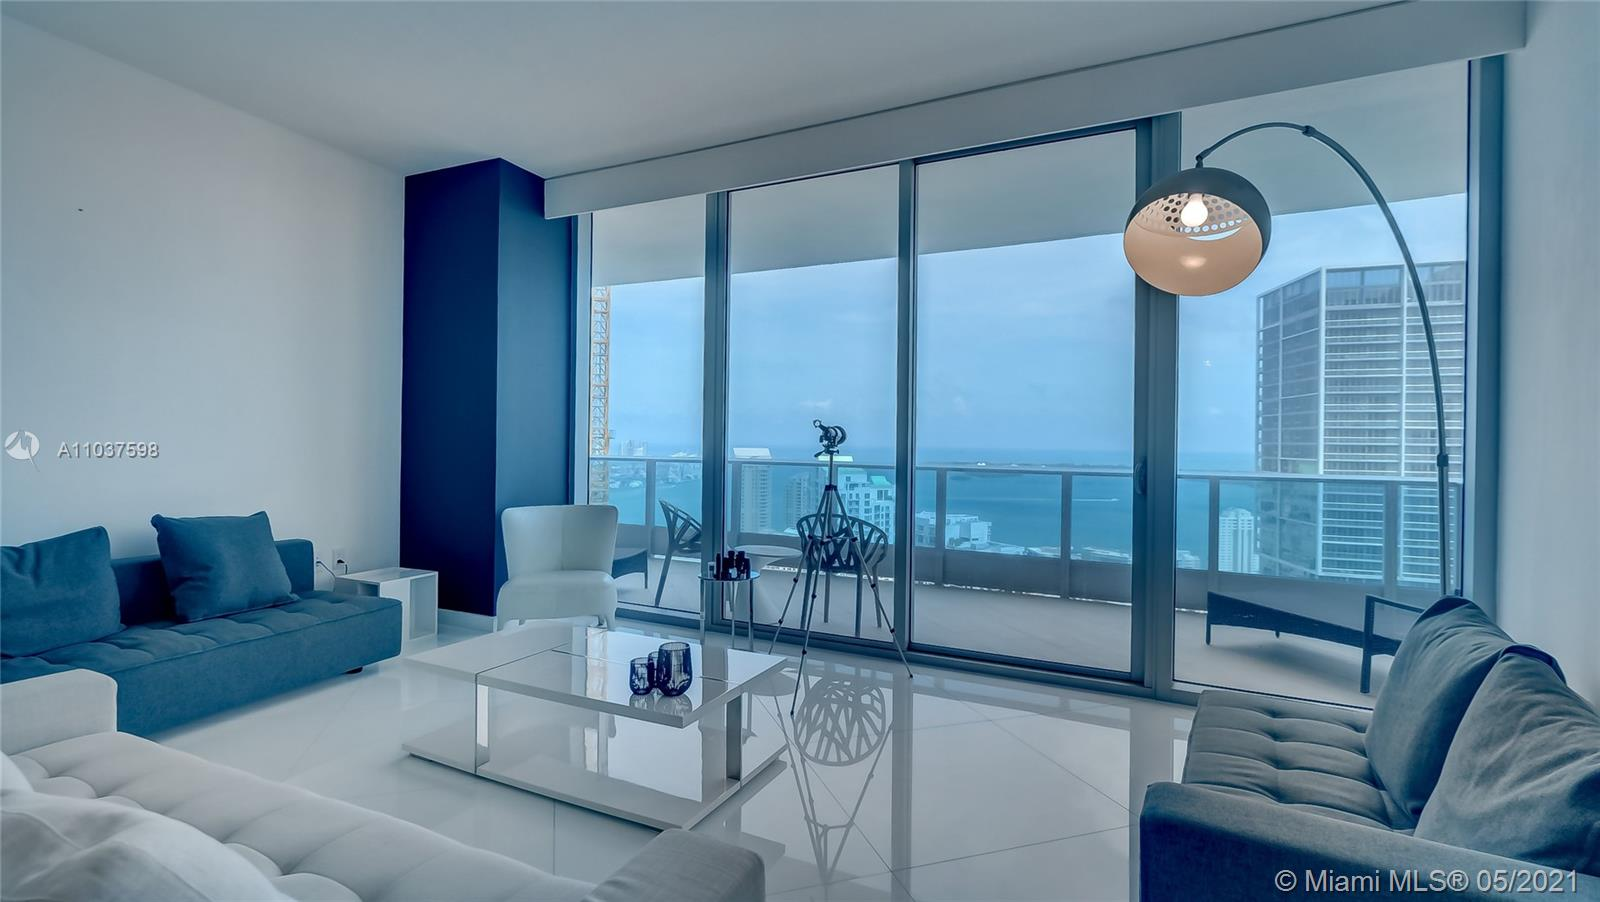 Epic Residences #5107 - 200 Biscayne Blvd way #5107, Miami, FL 33131